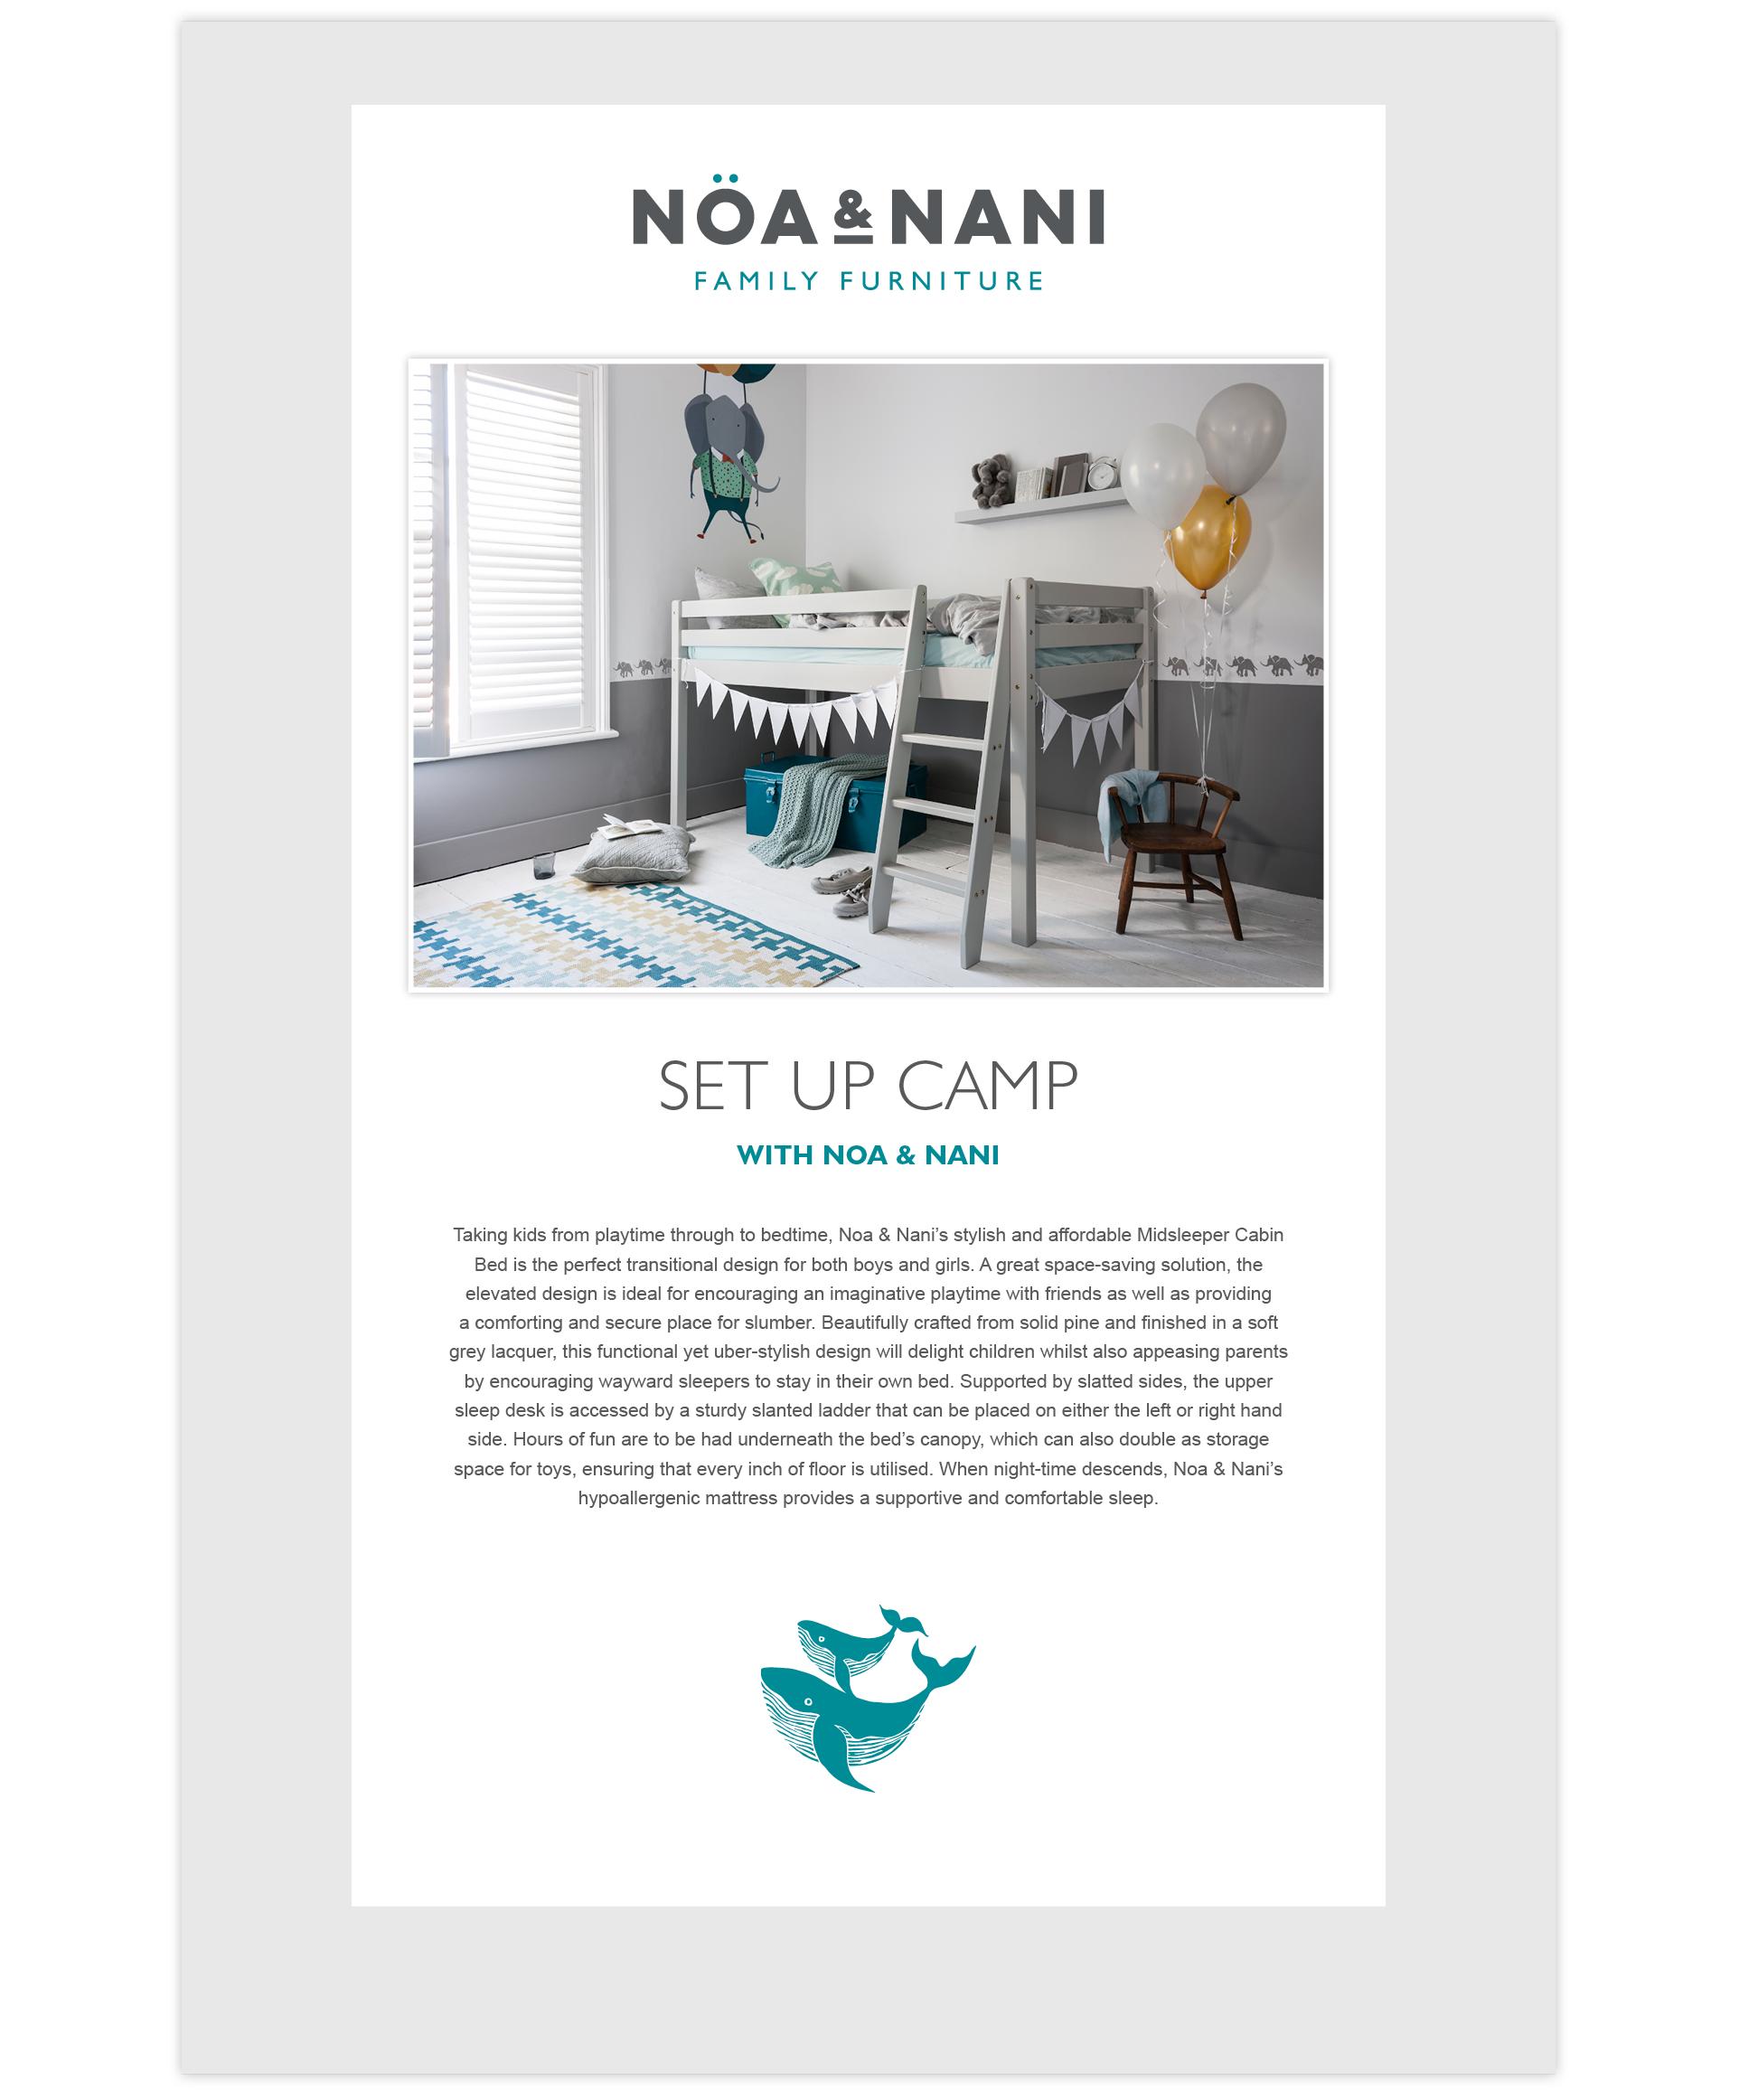 Noa & Nani Press Release Example